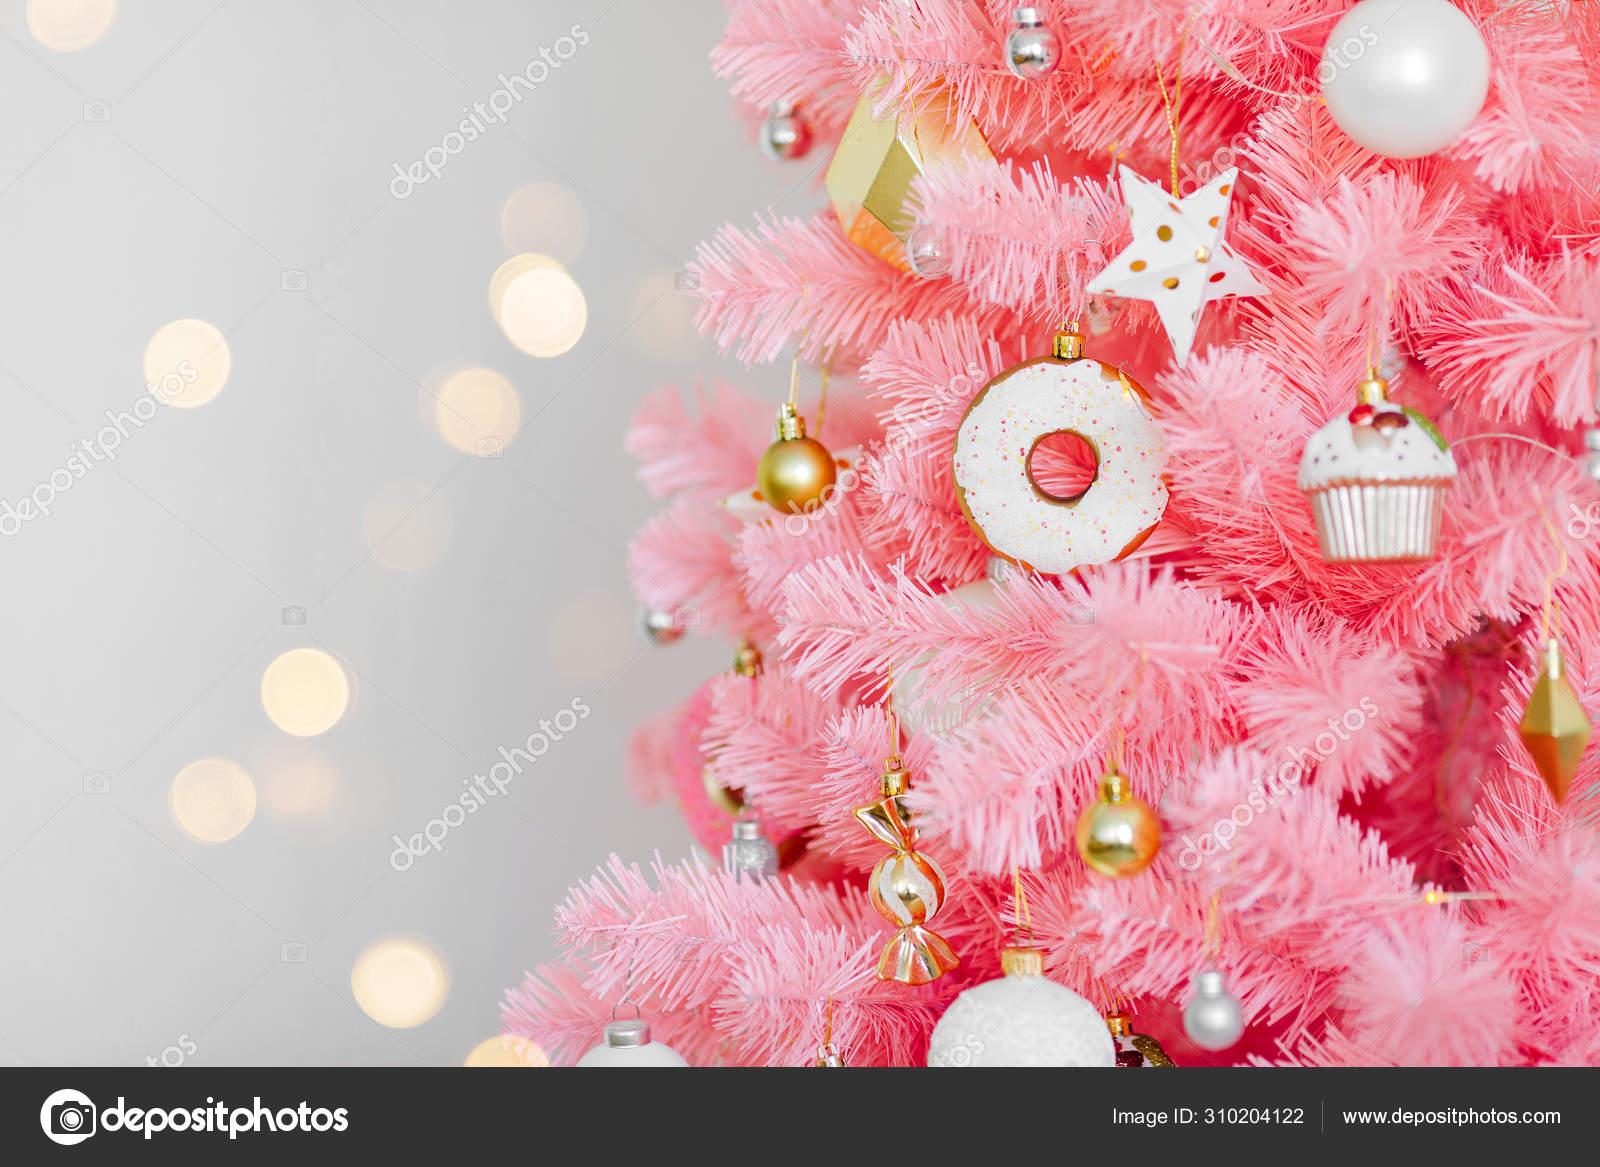 Pink Christmas Tree Christmas Decorations White Gold Color Christmas Background Stock Photo Image By C Igishevamaria 310204122